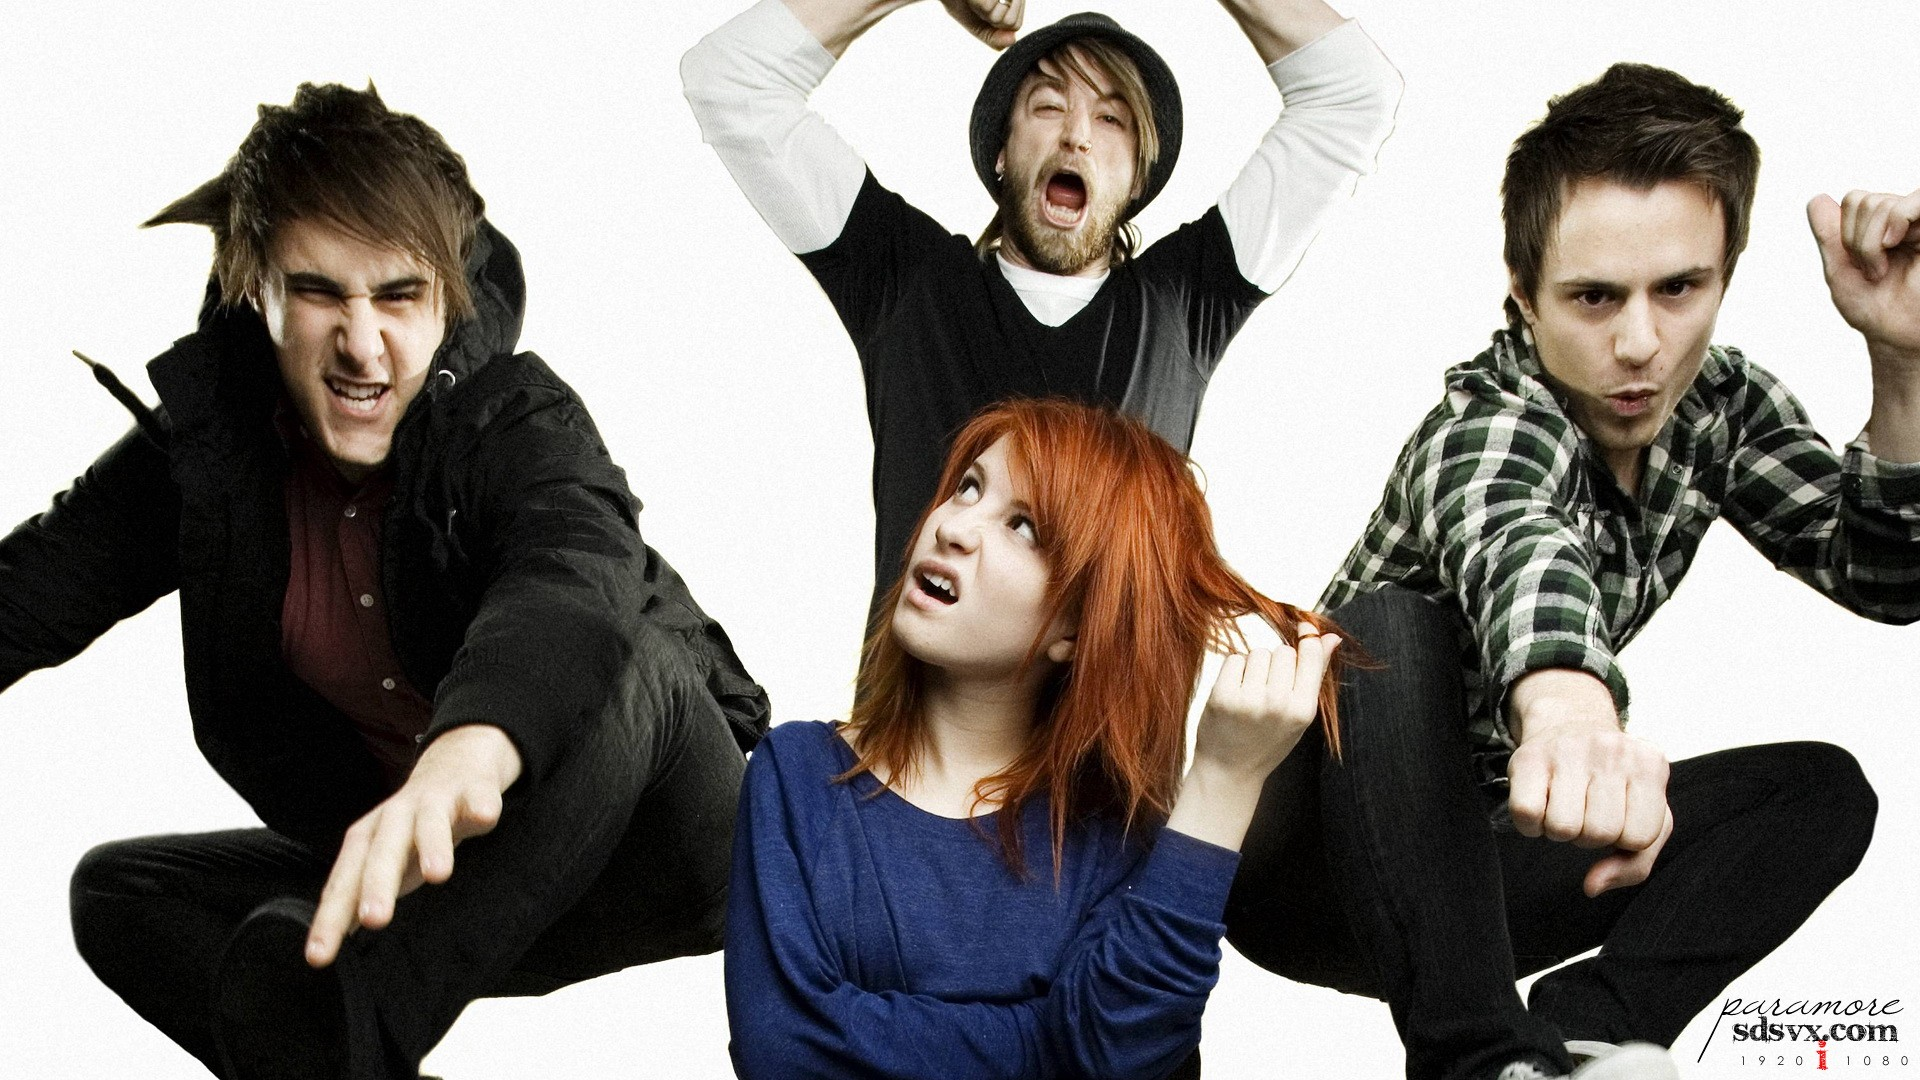 aaa - Paramore Photo (35209231) - Fanpop Paramore